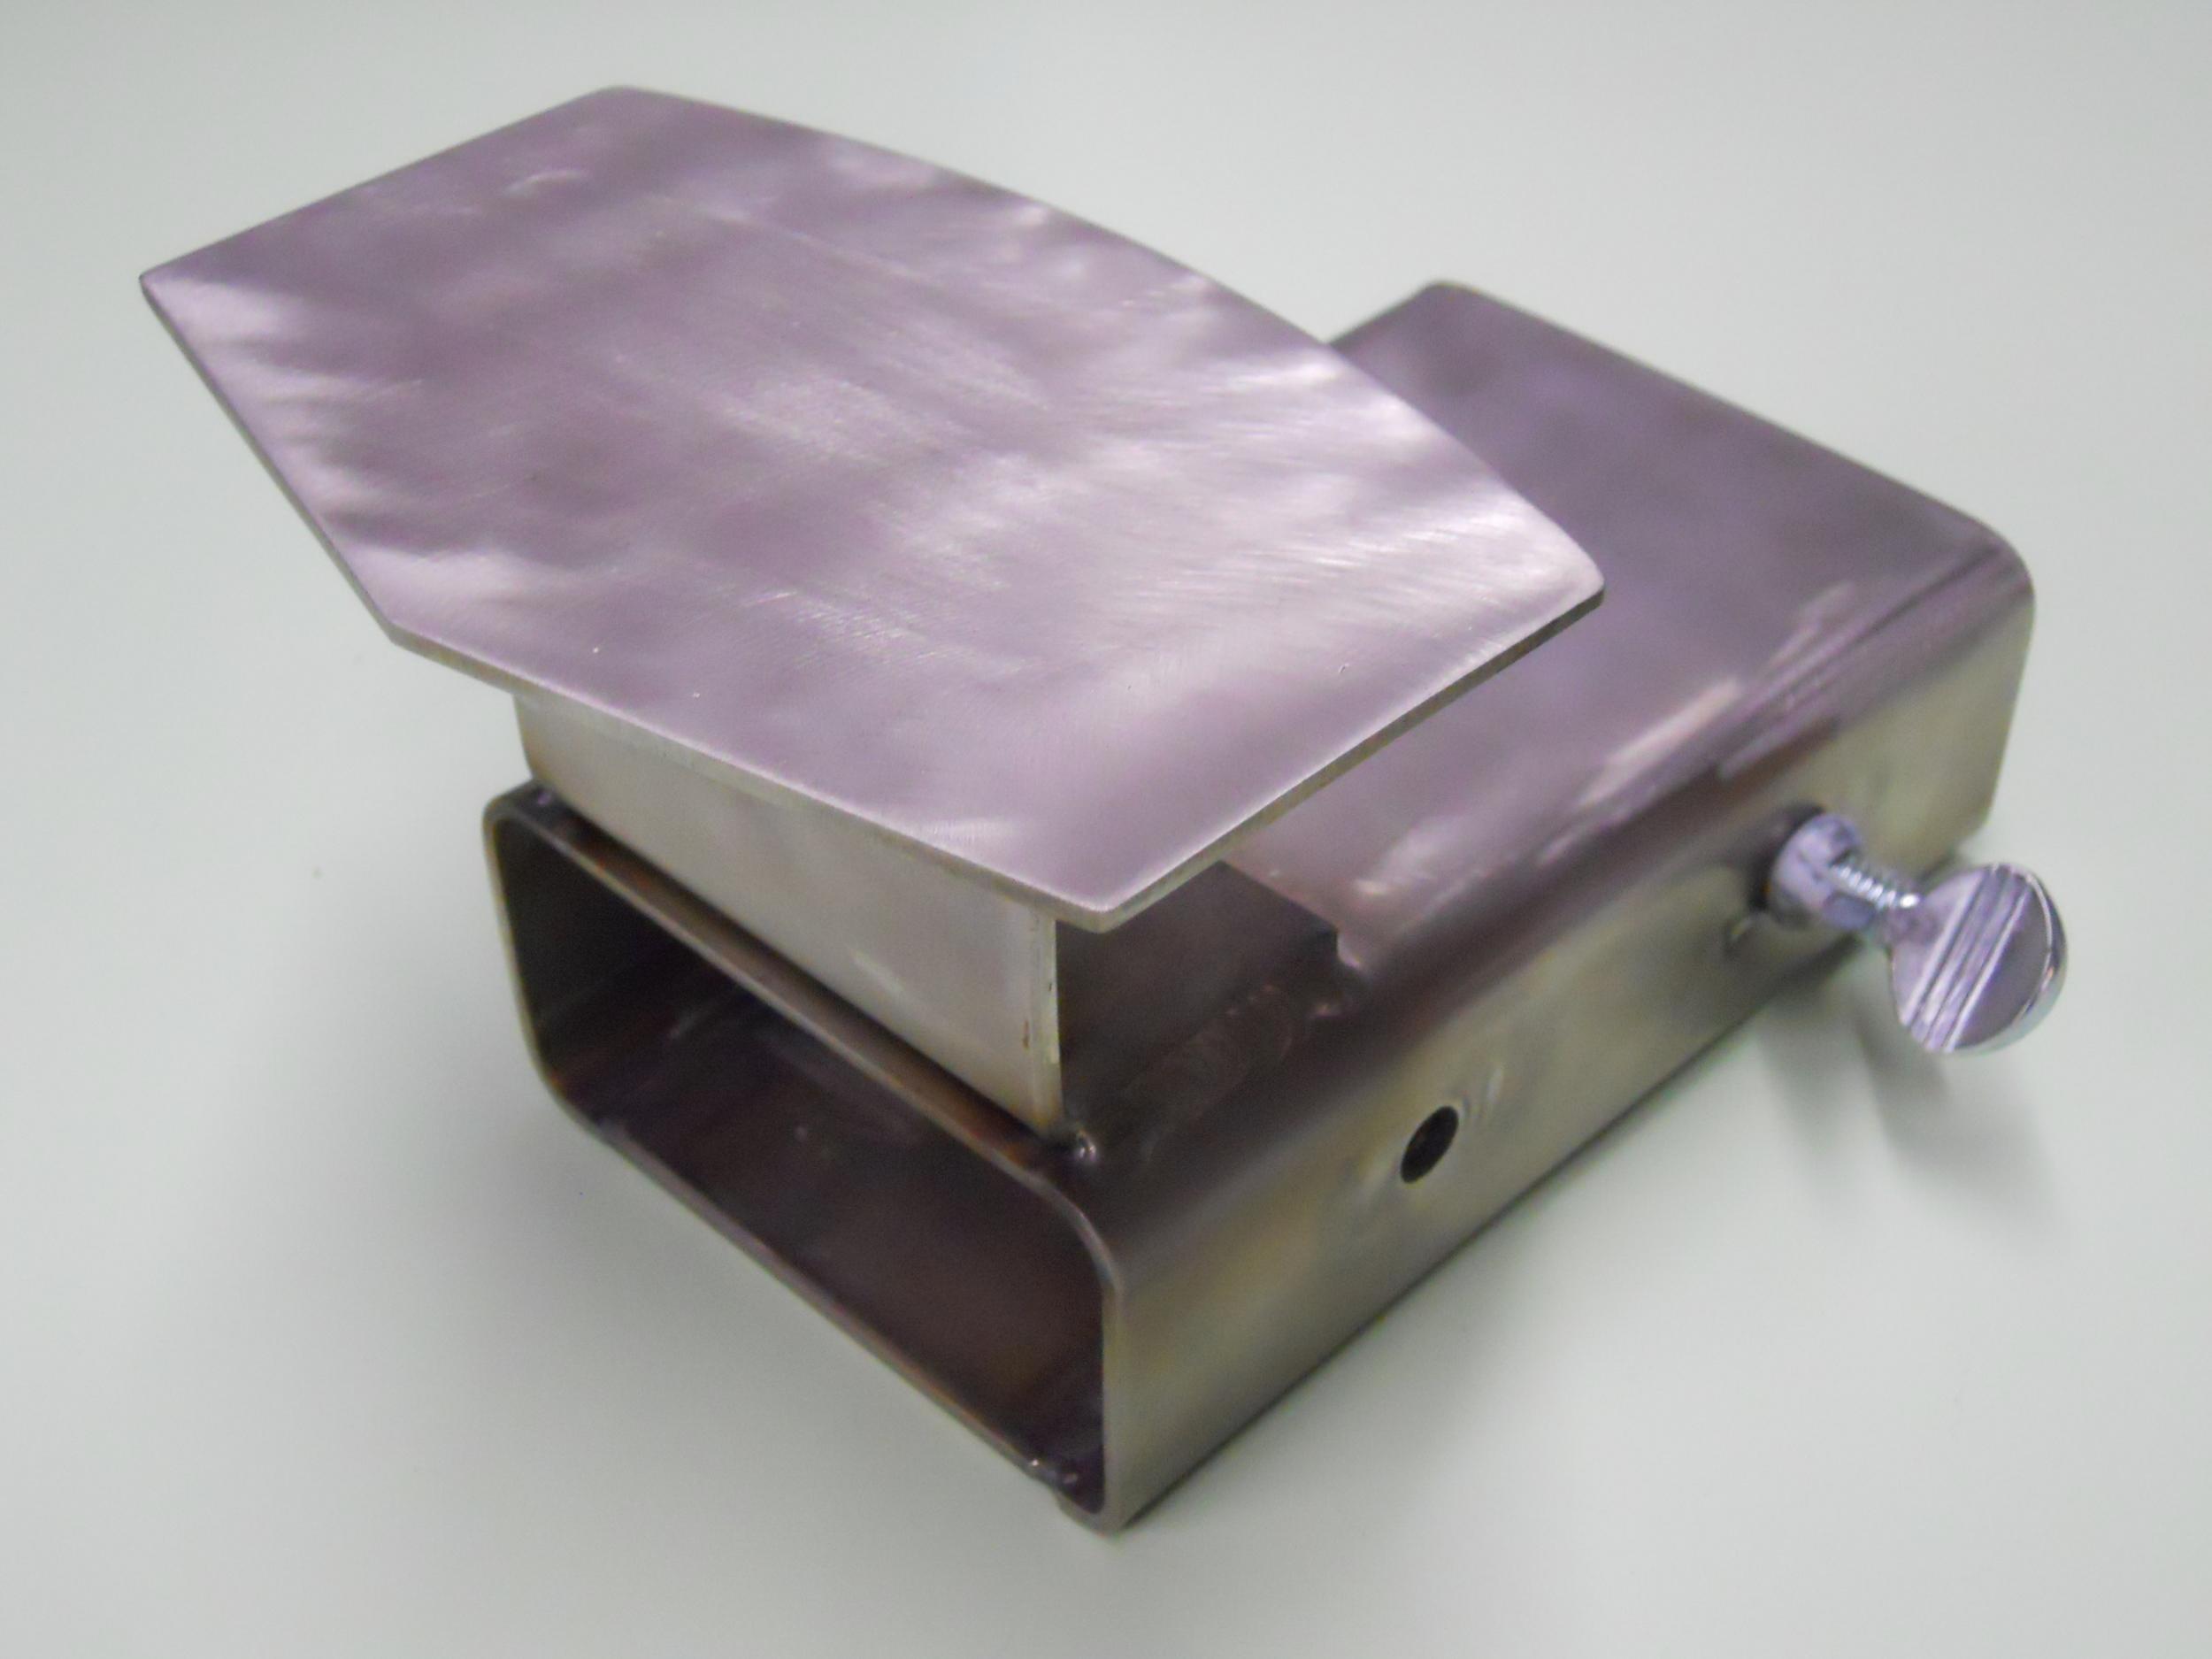 Stainless silk screen hat adaptor